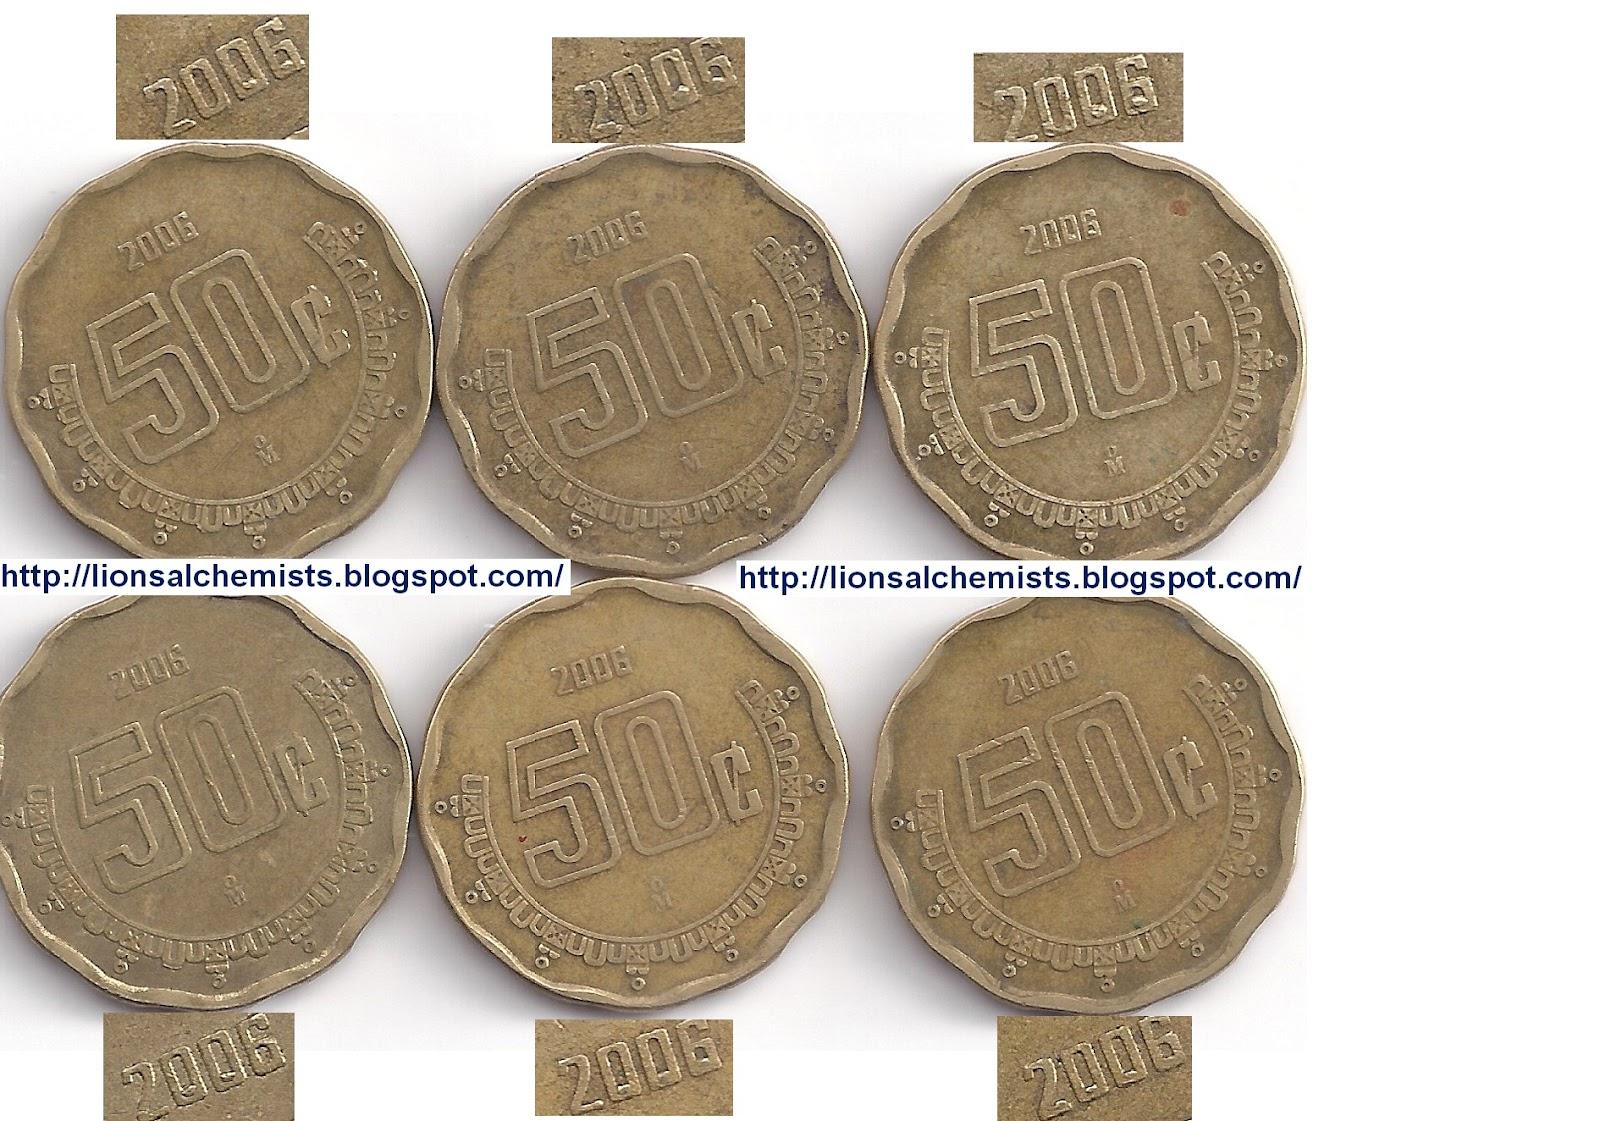 Lions Alchemists: 50 centavos Cono Monetario